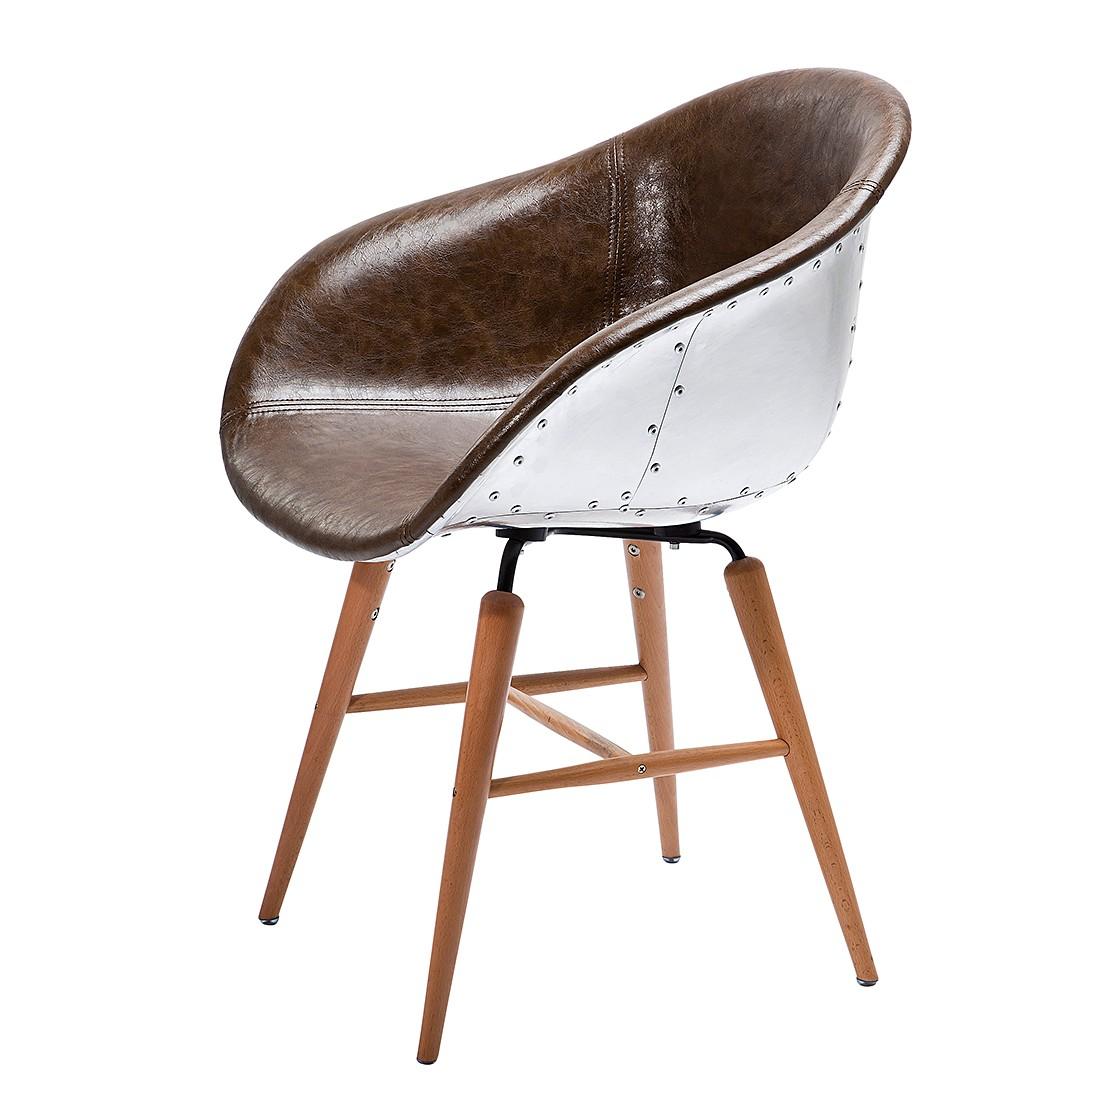 Kare design stuhl preisvergleich die besten angebote for Stuhl mit armlehne kunstleder